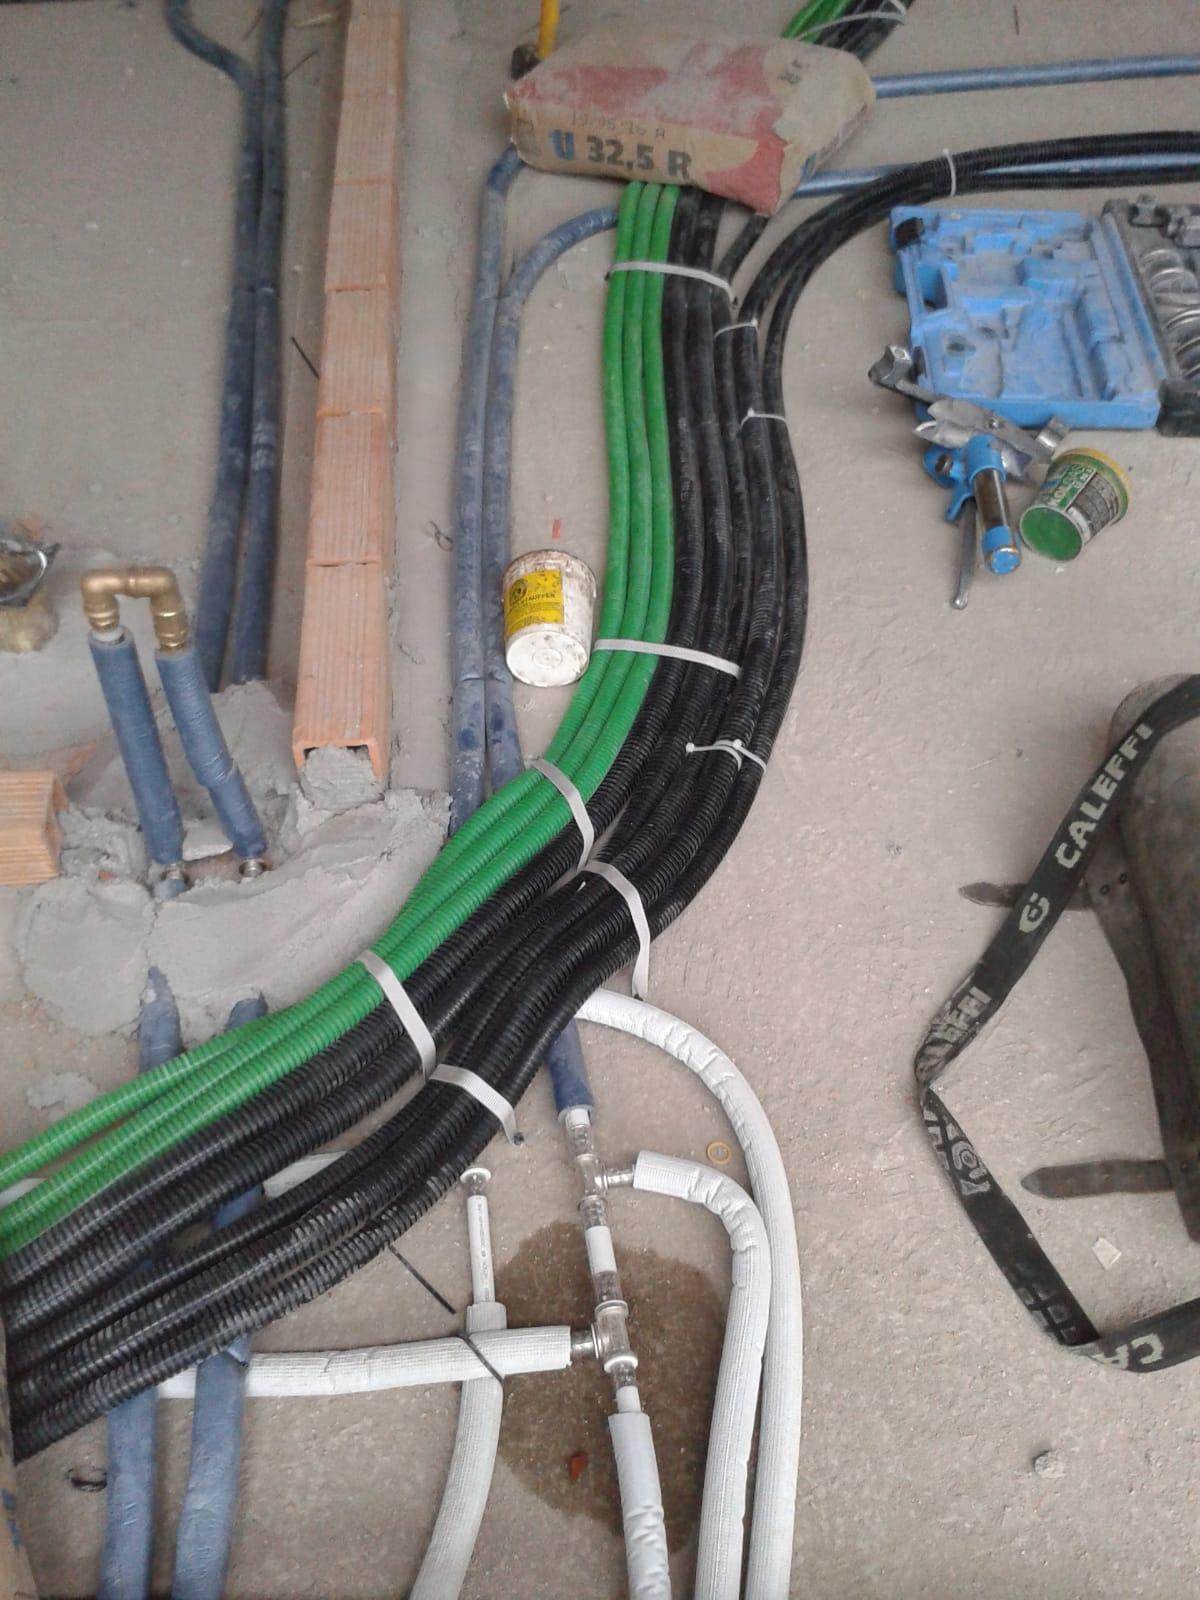 Assistenza impianti idrici ed elettrici Fraternali Cristian Impresa edile